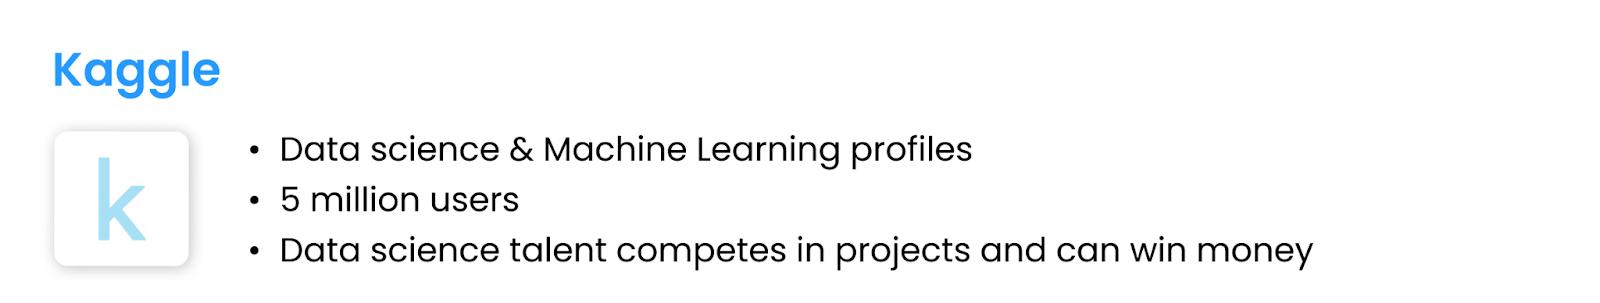 kaggle.com